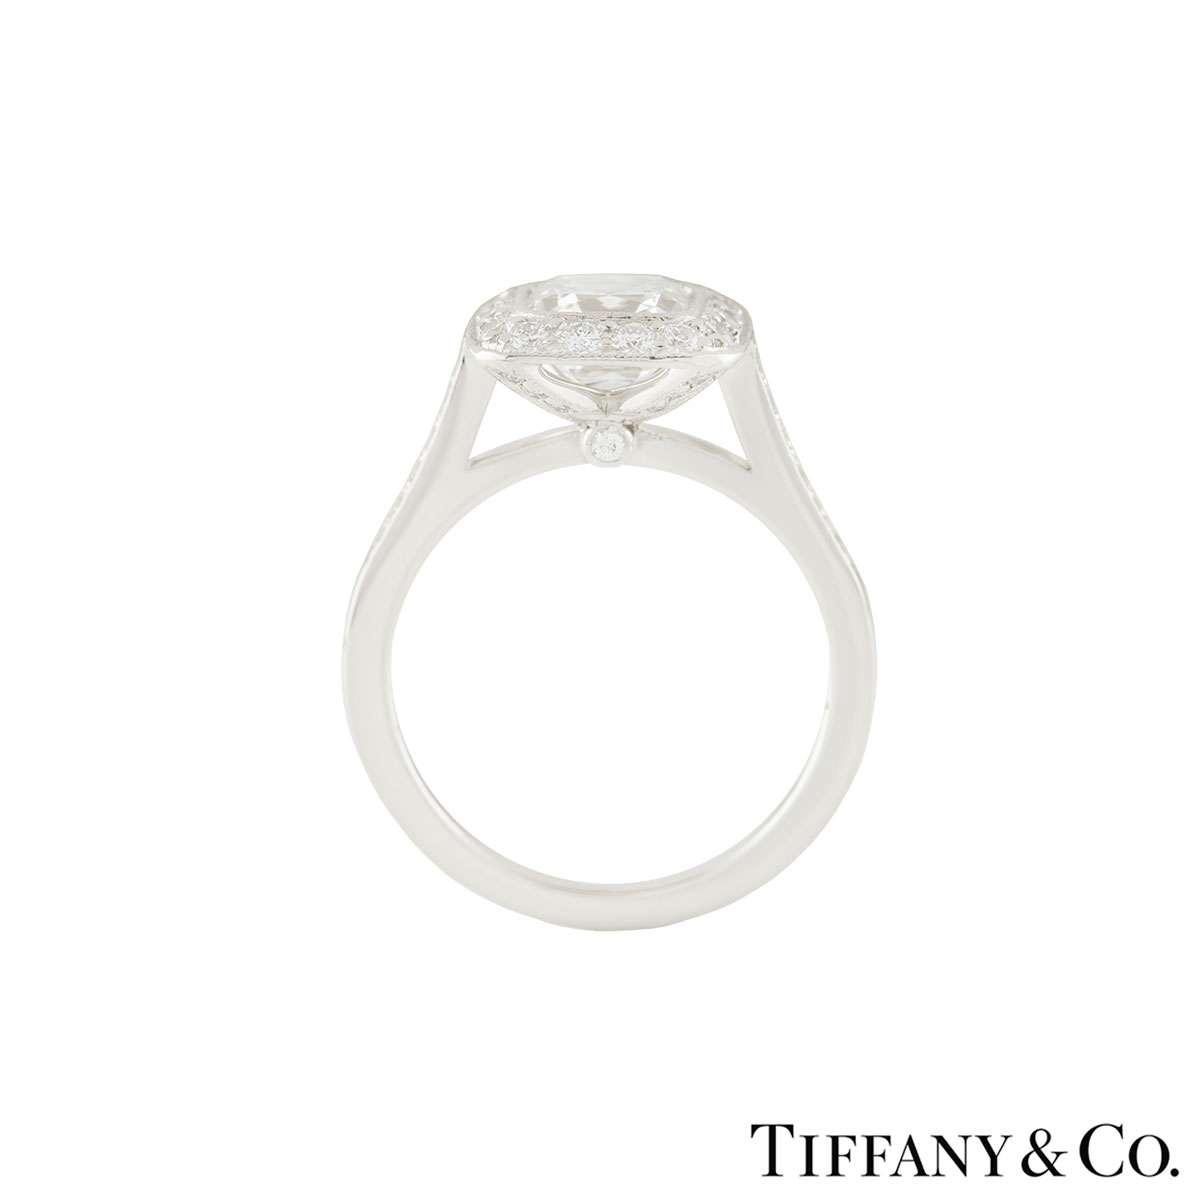 Tiffany & Co. Platinum Legacy Diamond Ring 1.54ct G/VVS1